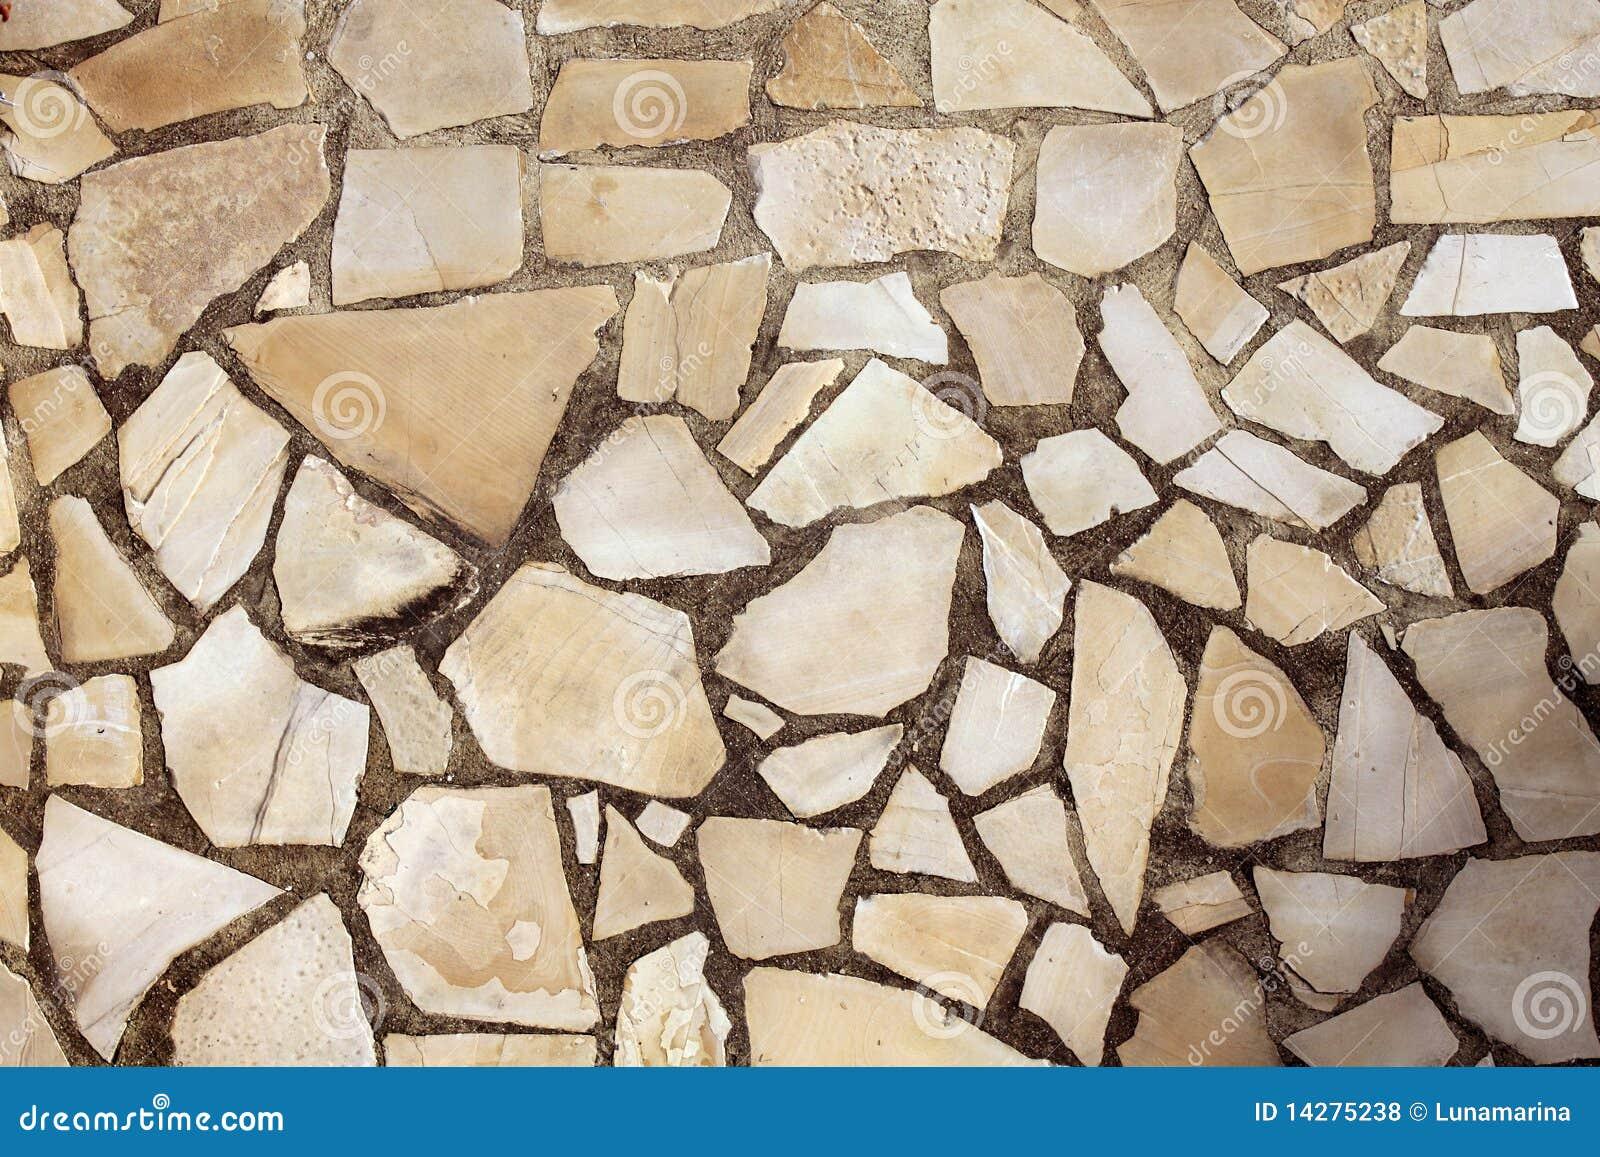 Masonry Rock Stone Tiles Floor On The Park Stock Photo